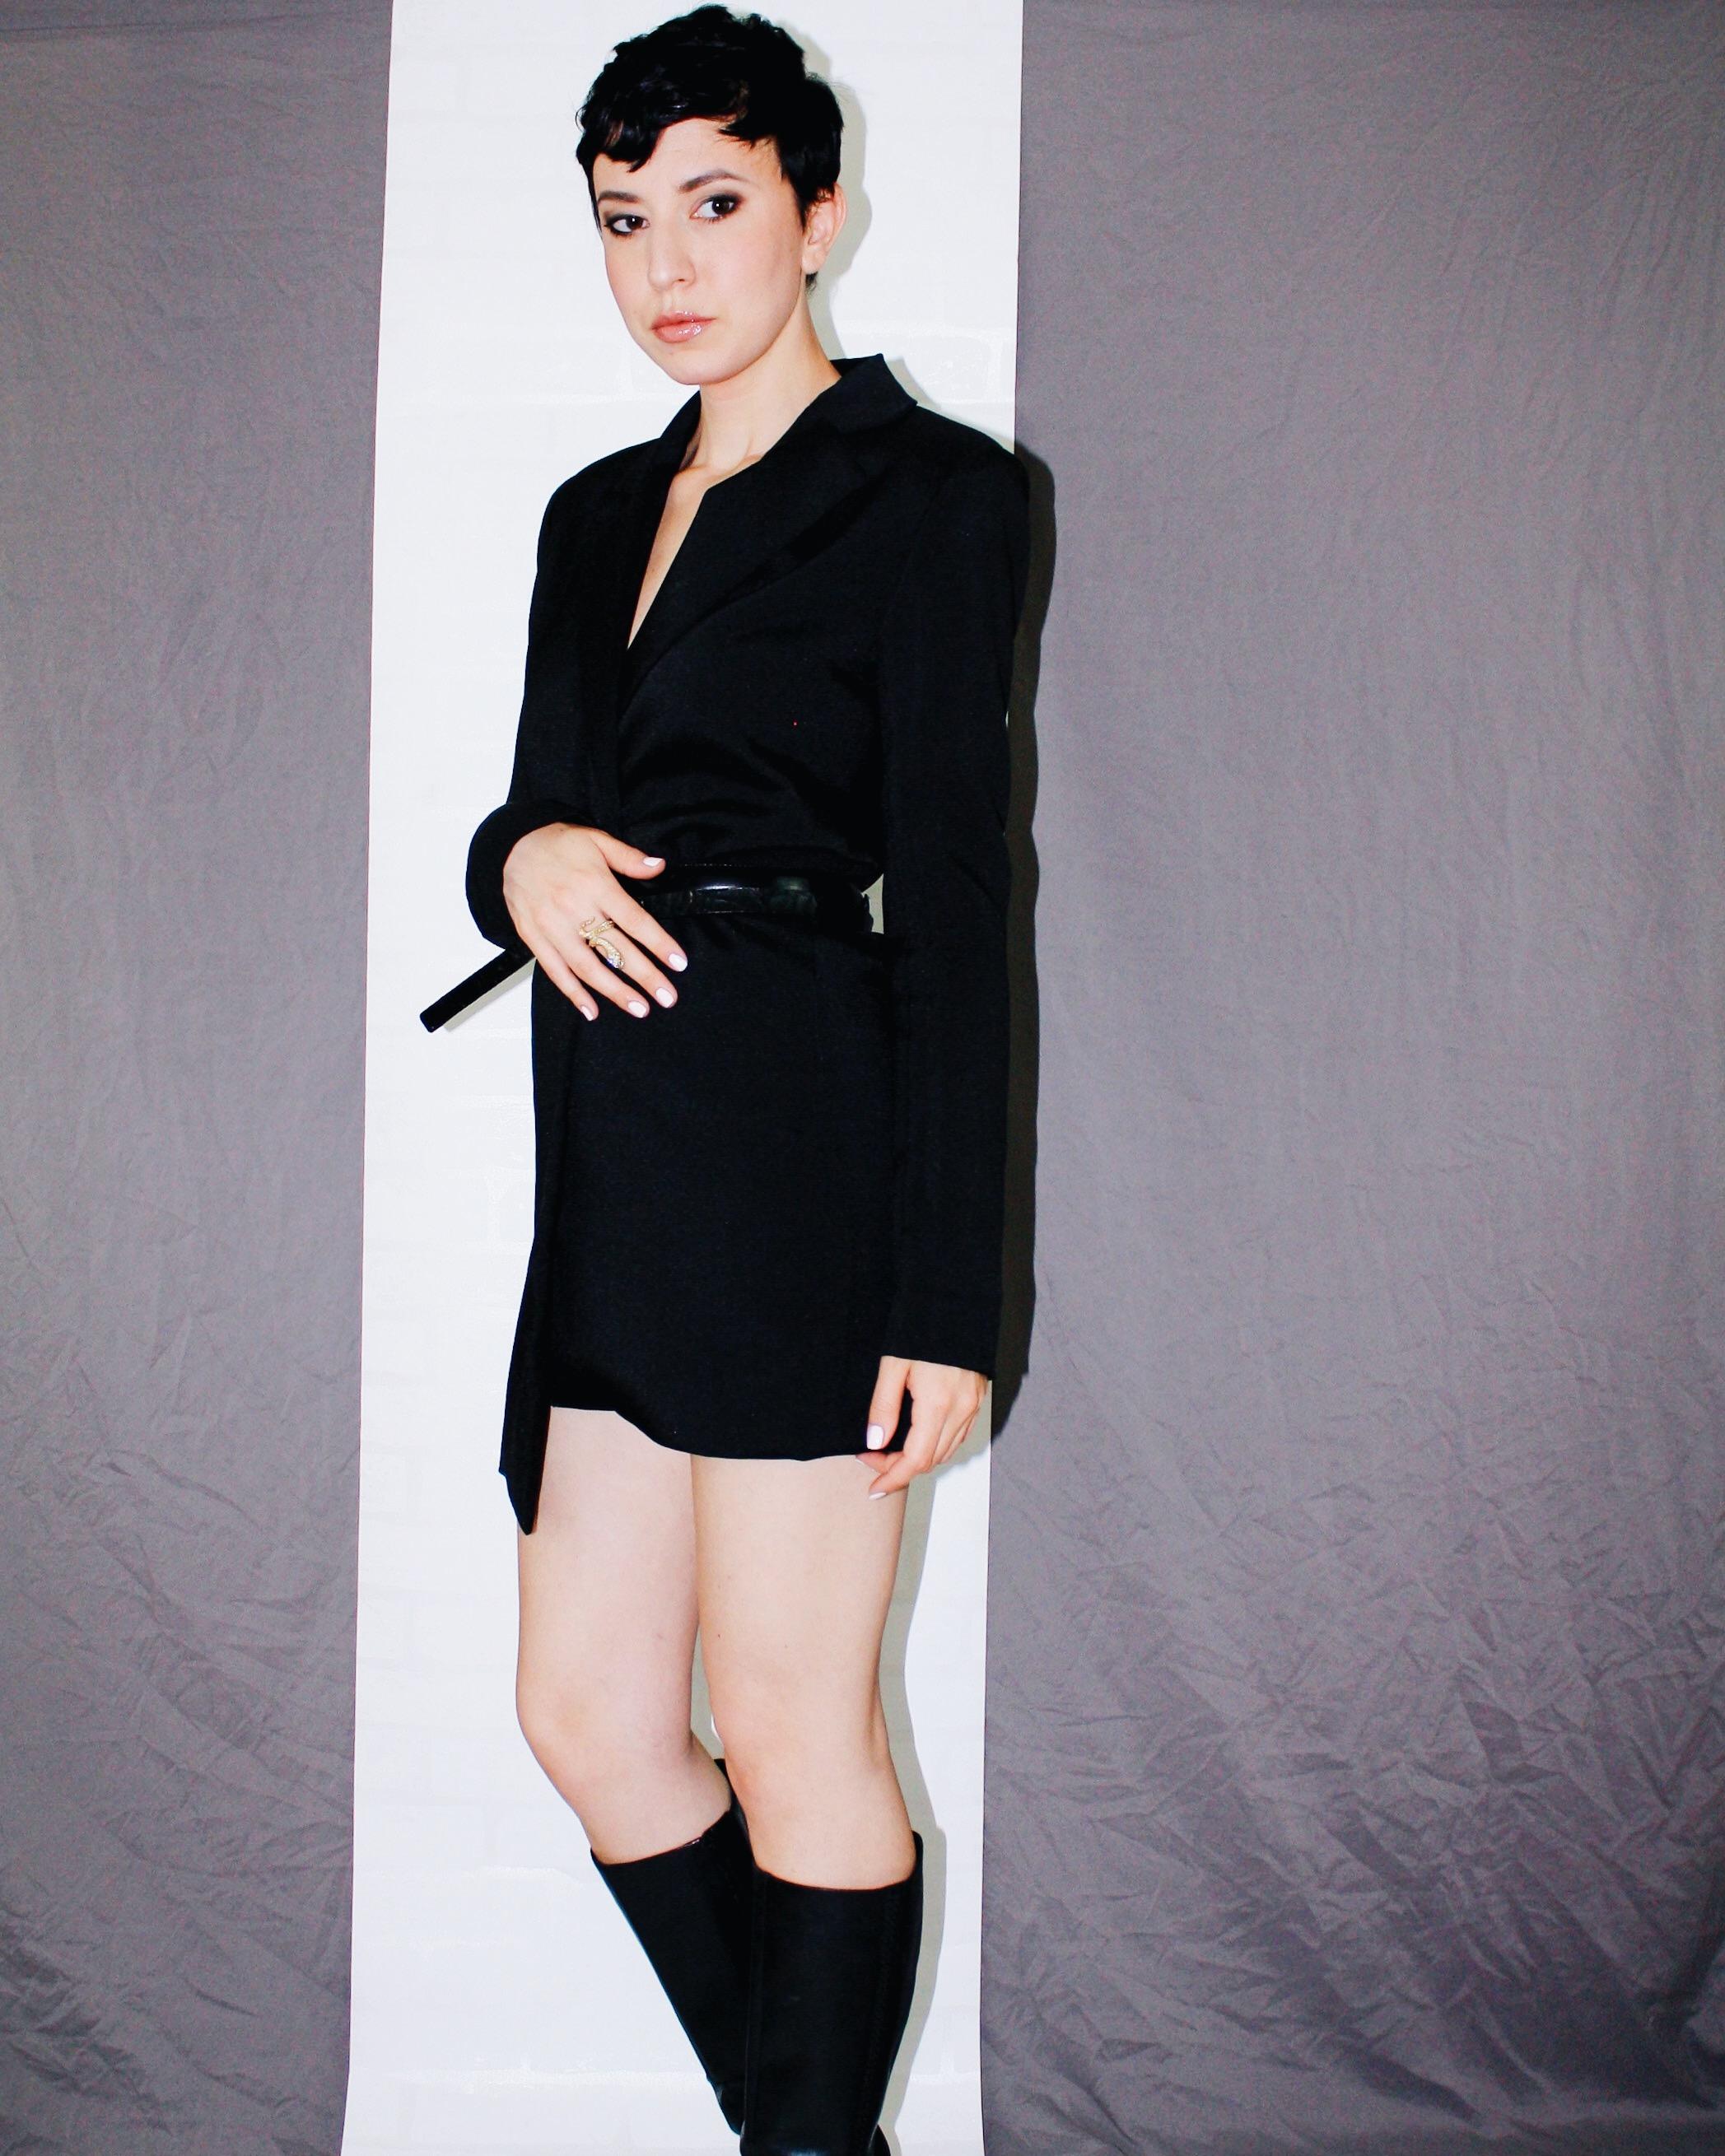 fall is here boots leather helmut lang blazer dress belts black 8